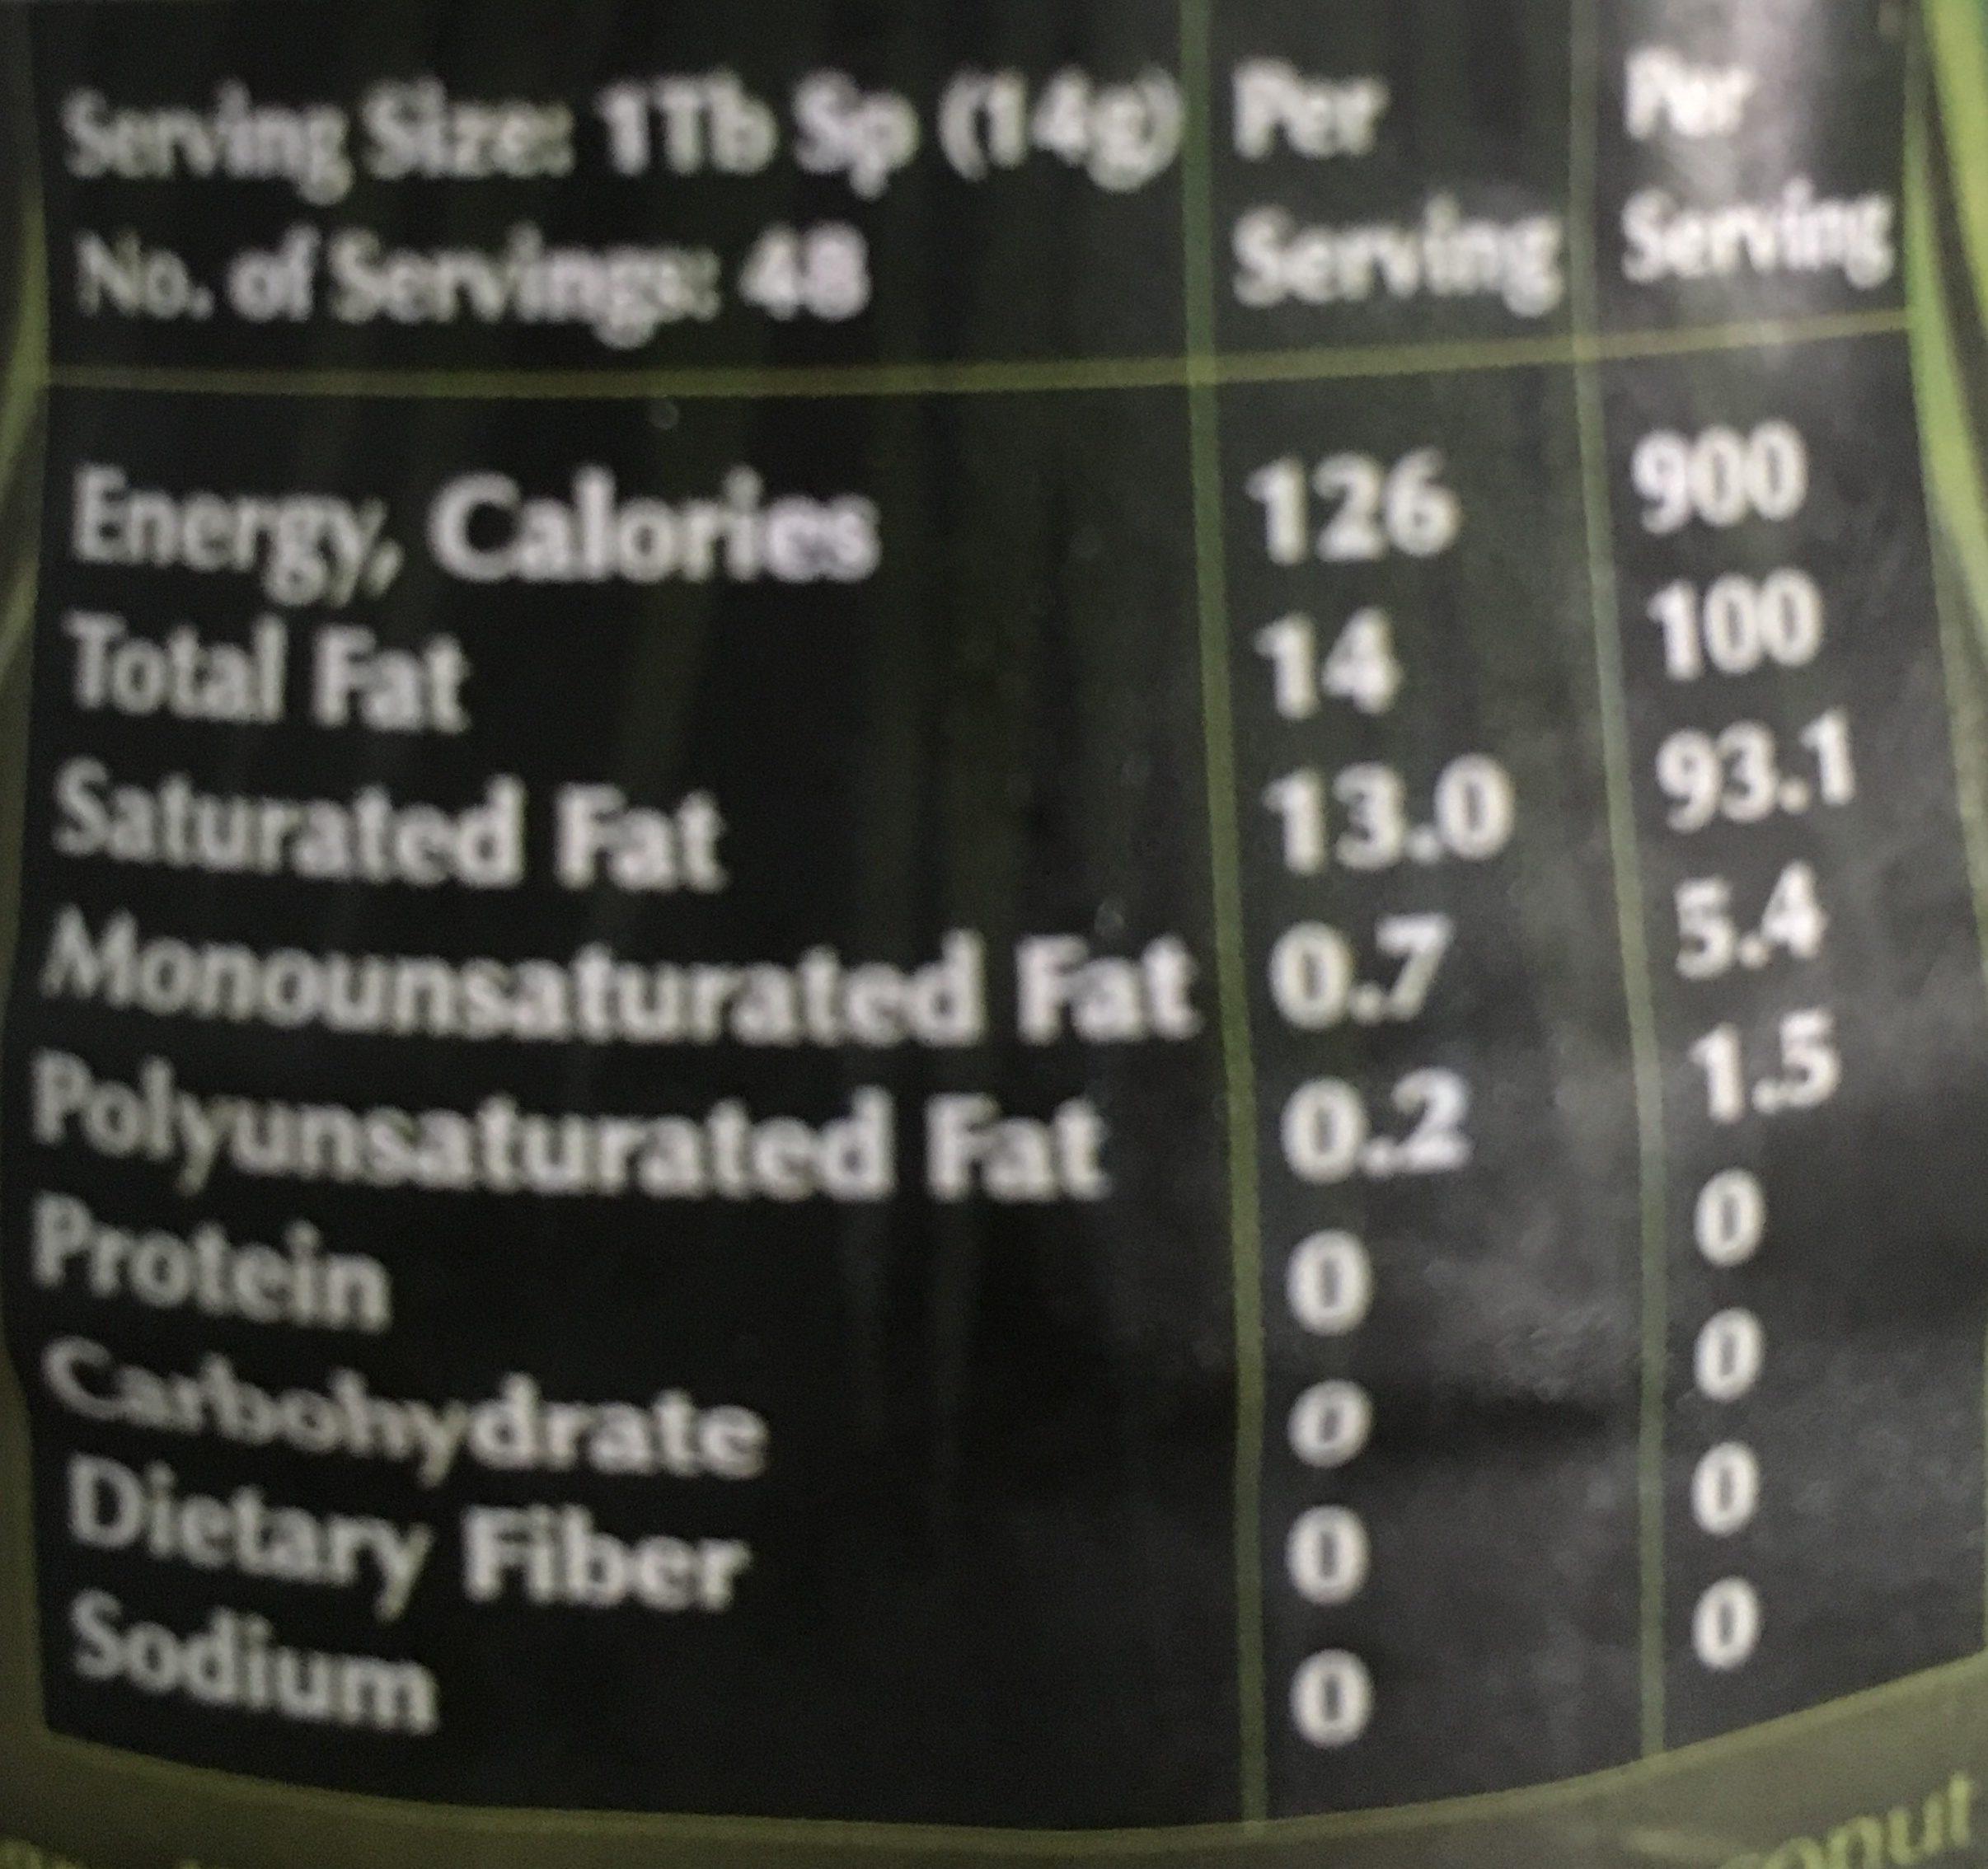 Hemani Coconut Oil Pure & Natural (400ML) - المكونات - fr